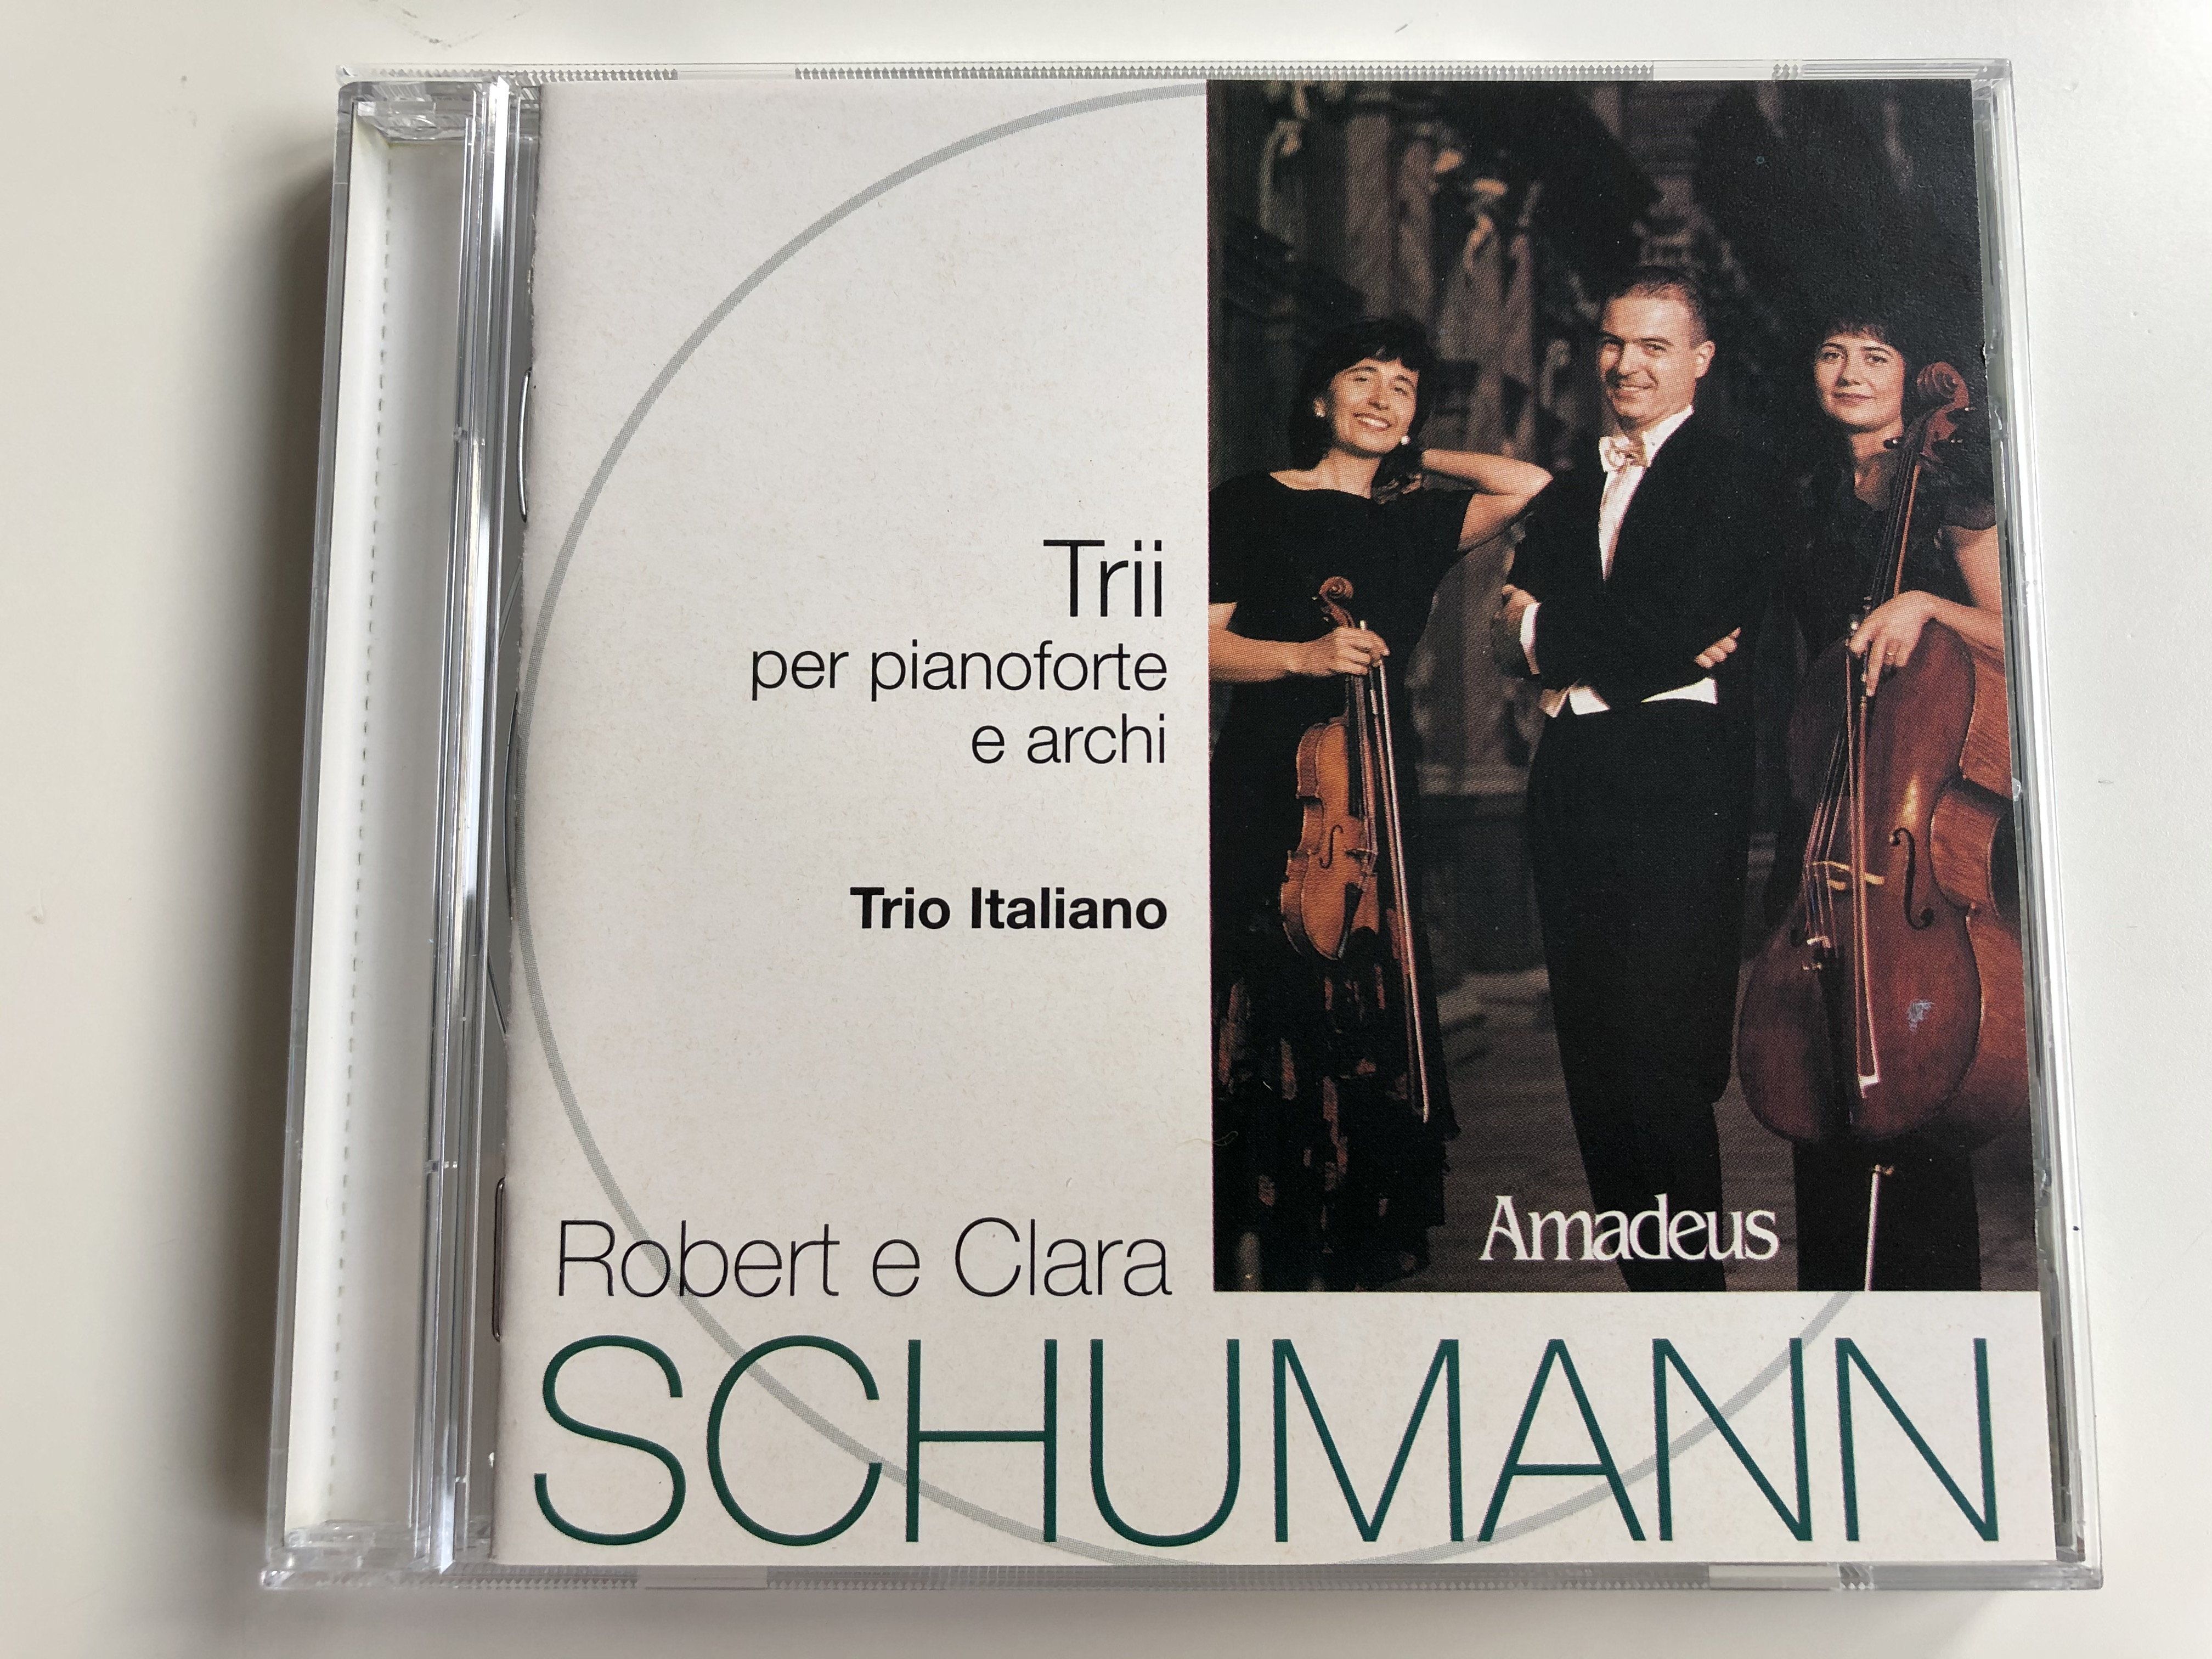 trii-per-pianoforte-e-archi-trio-italiano-robert-e-clara-schumann-amadeus-audio-cd-2001-am-140-2-1-.jpg